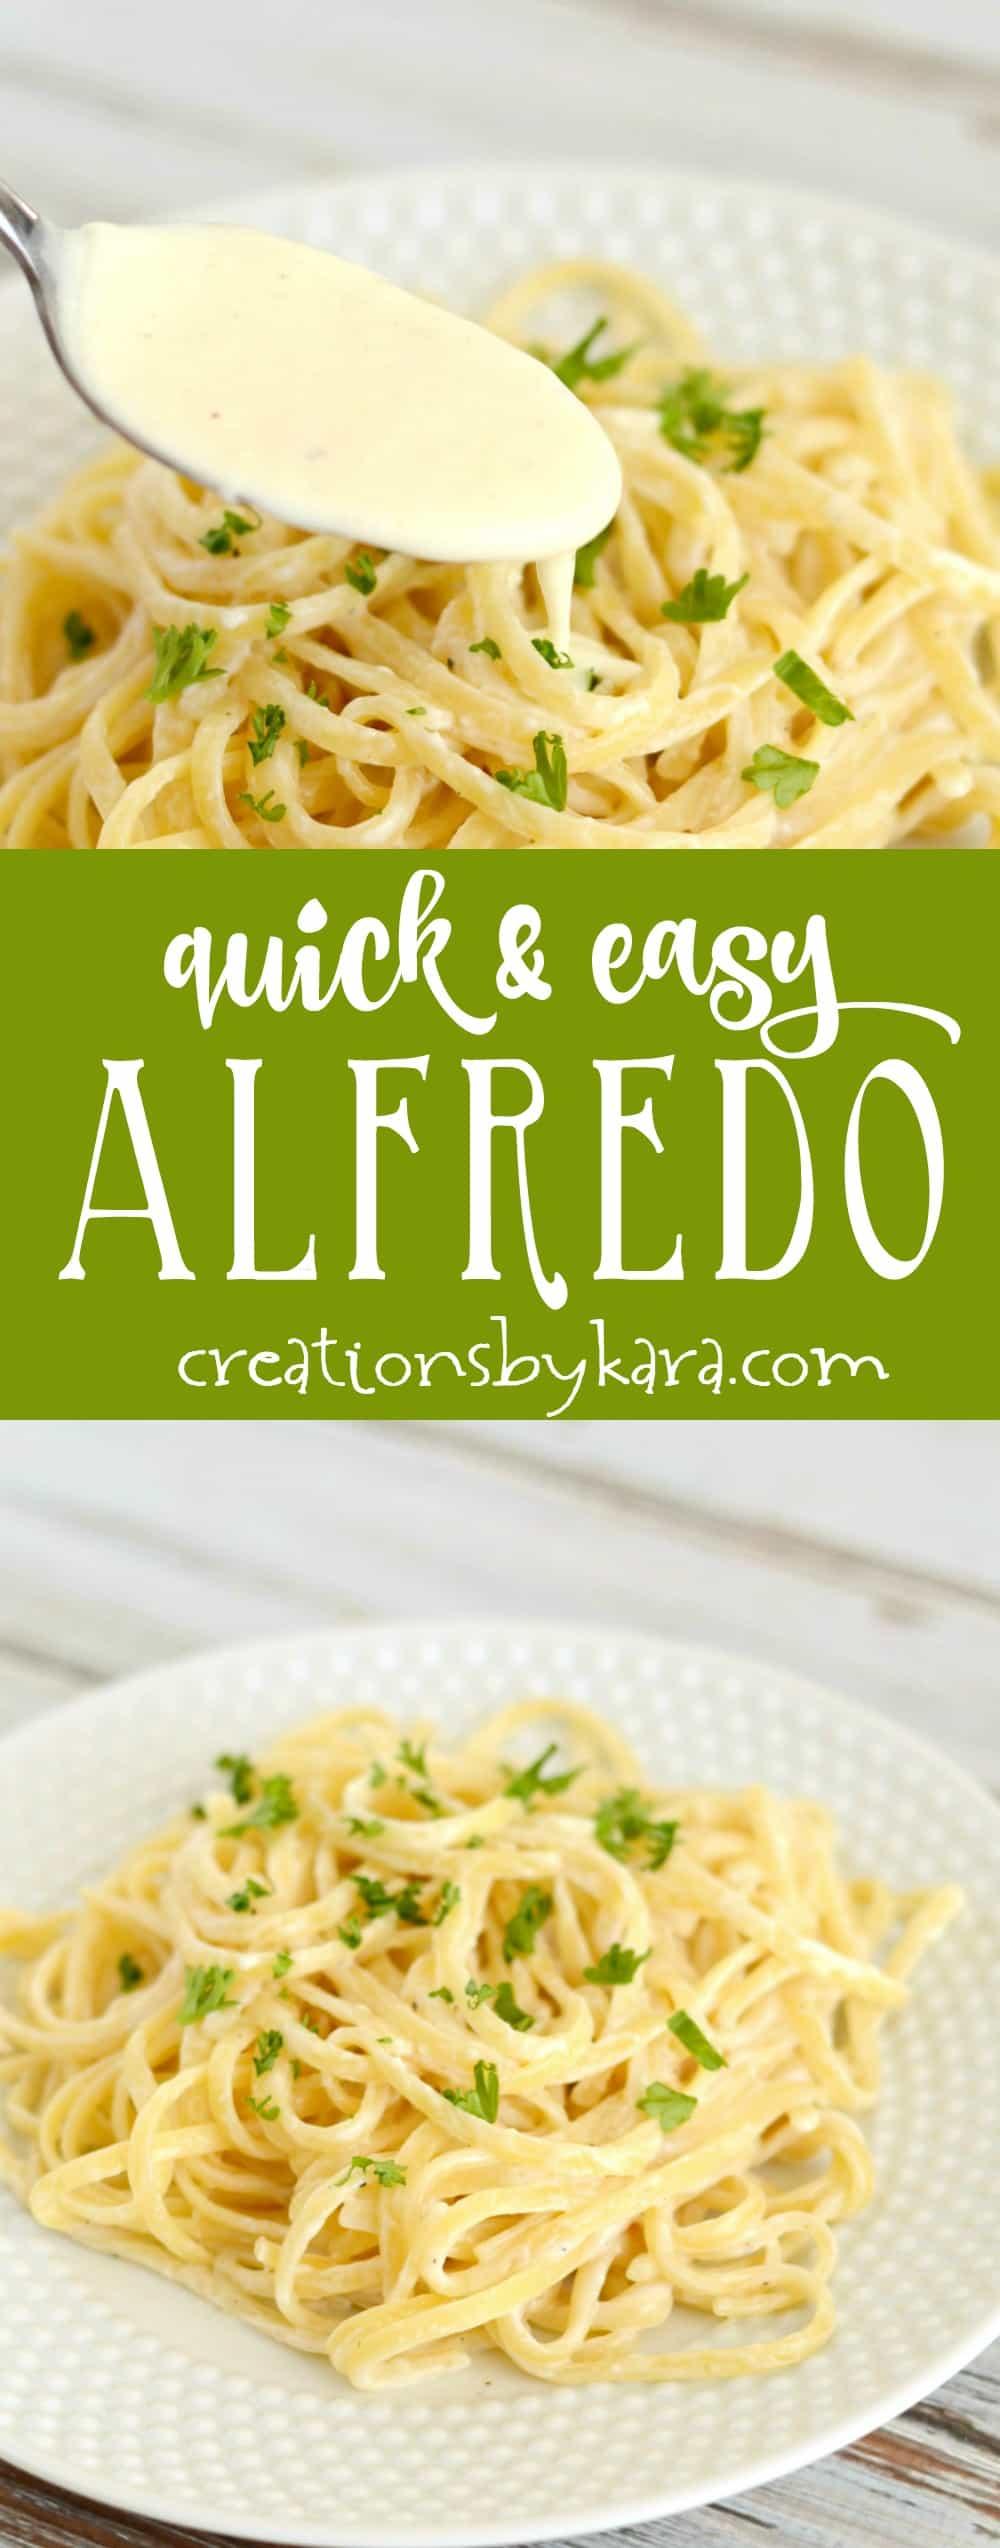 Easy Simple Dinner Recipes